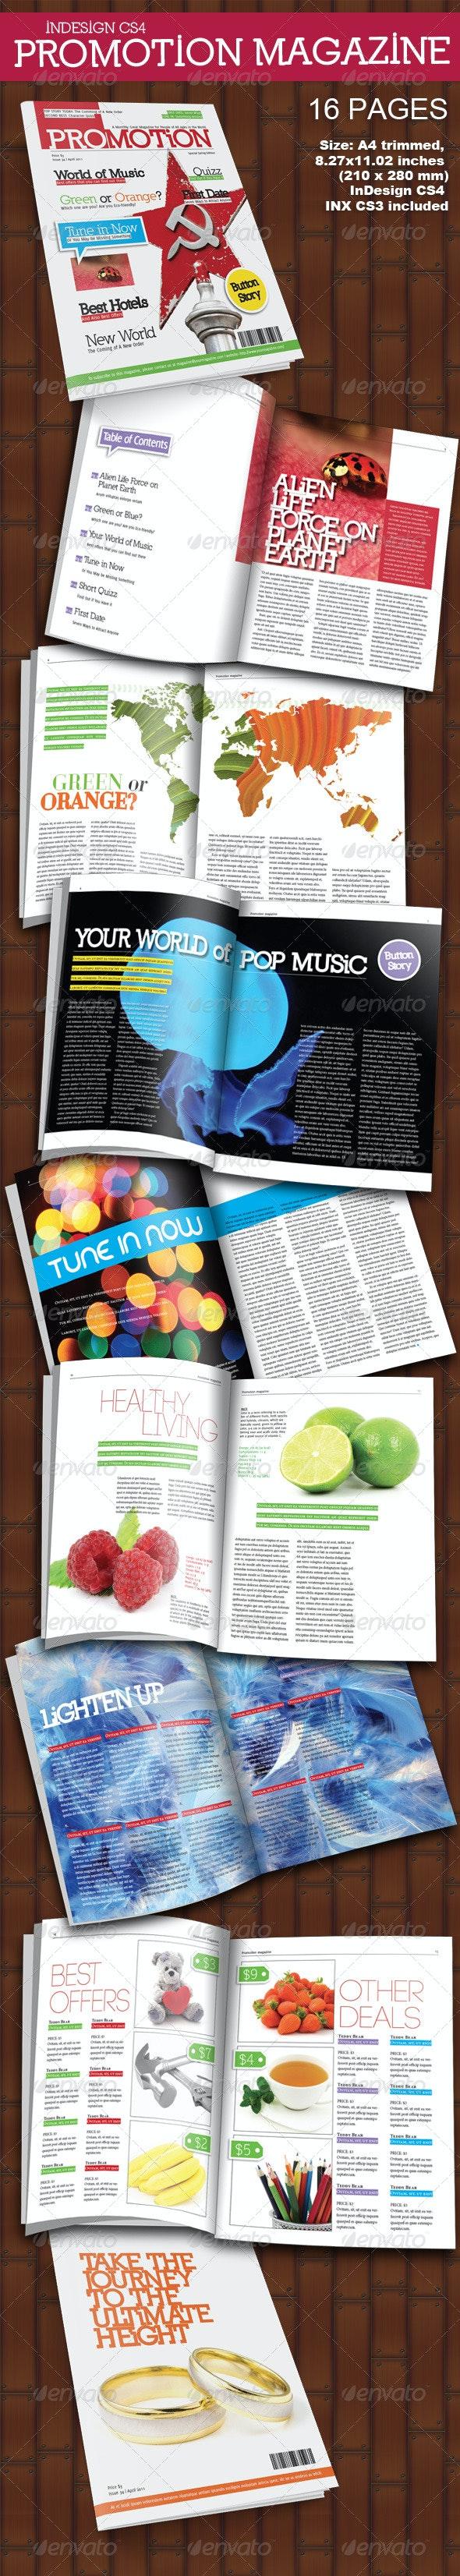 Promotion Magazine 16 Pages - Magazines Print Templates